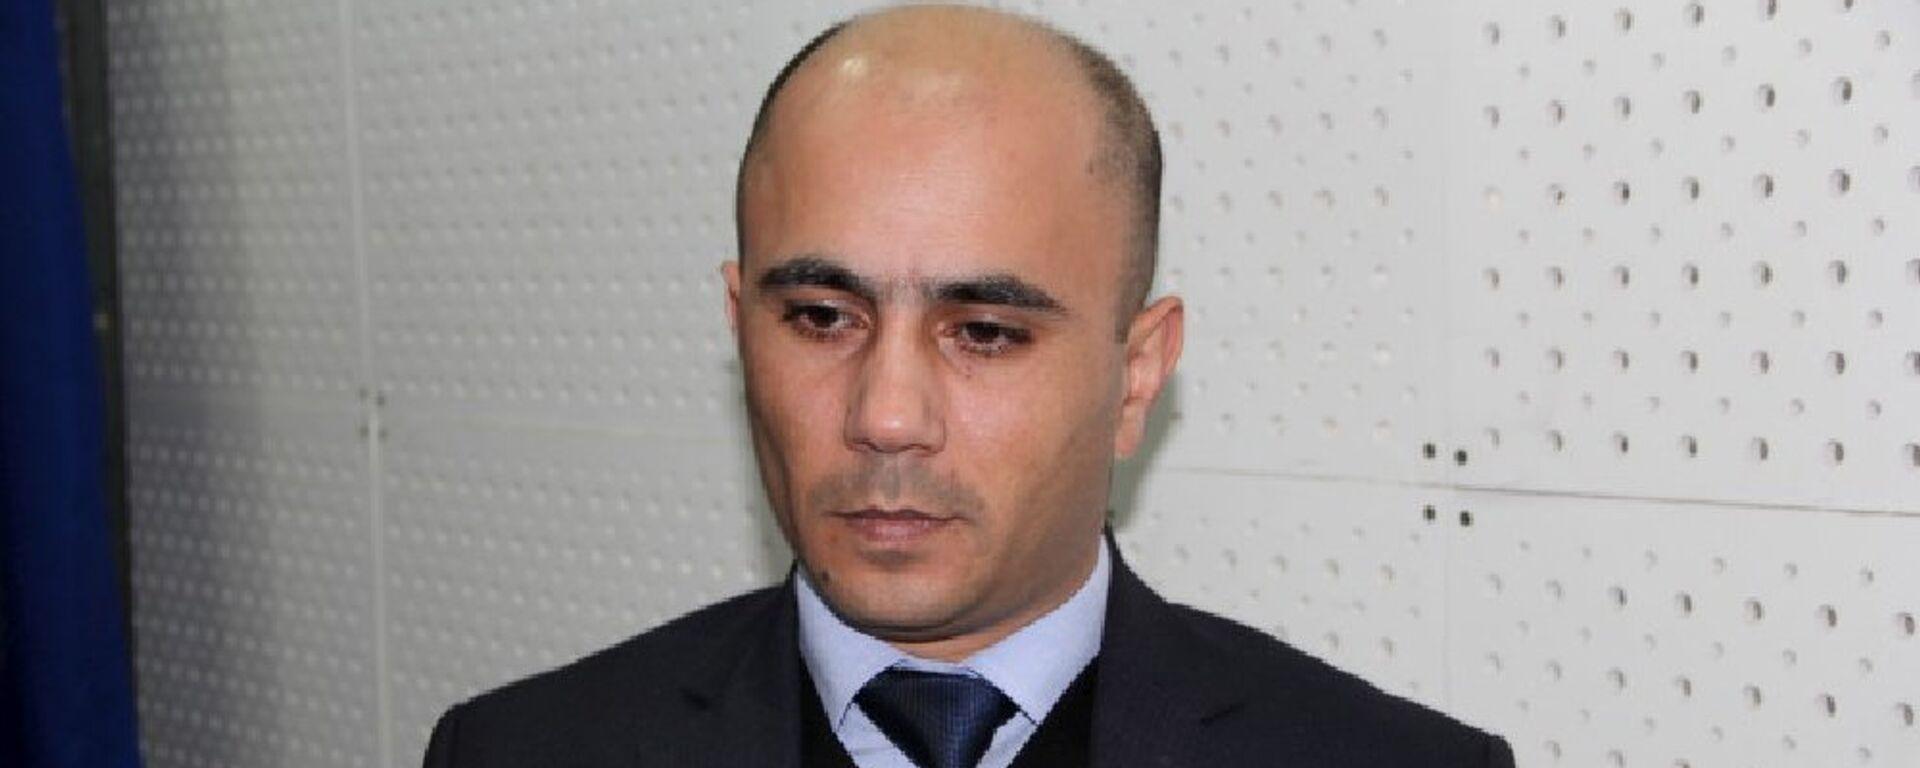 Эксперт-экономист Рашад Гасанов - Sputnik Азербайджан, 1920, 28.09.2021